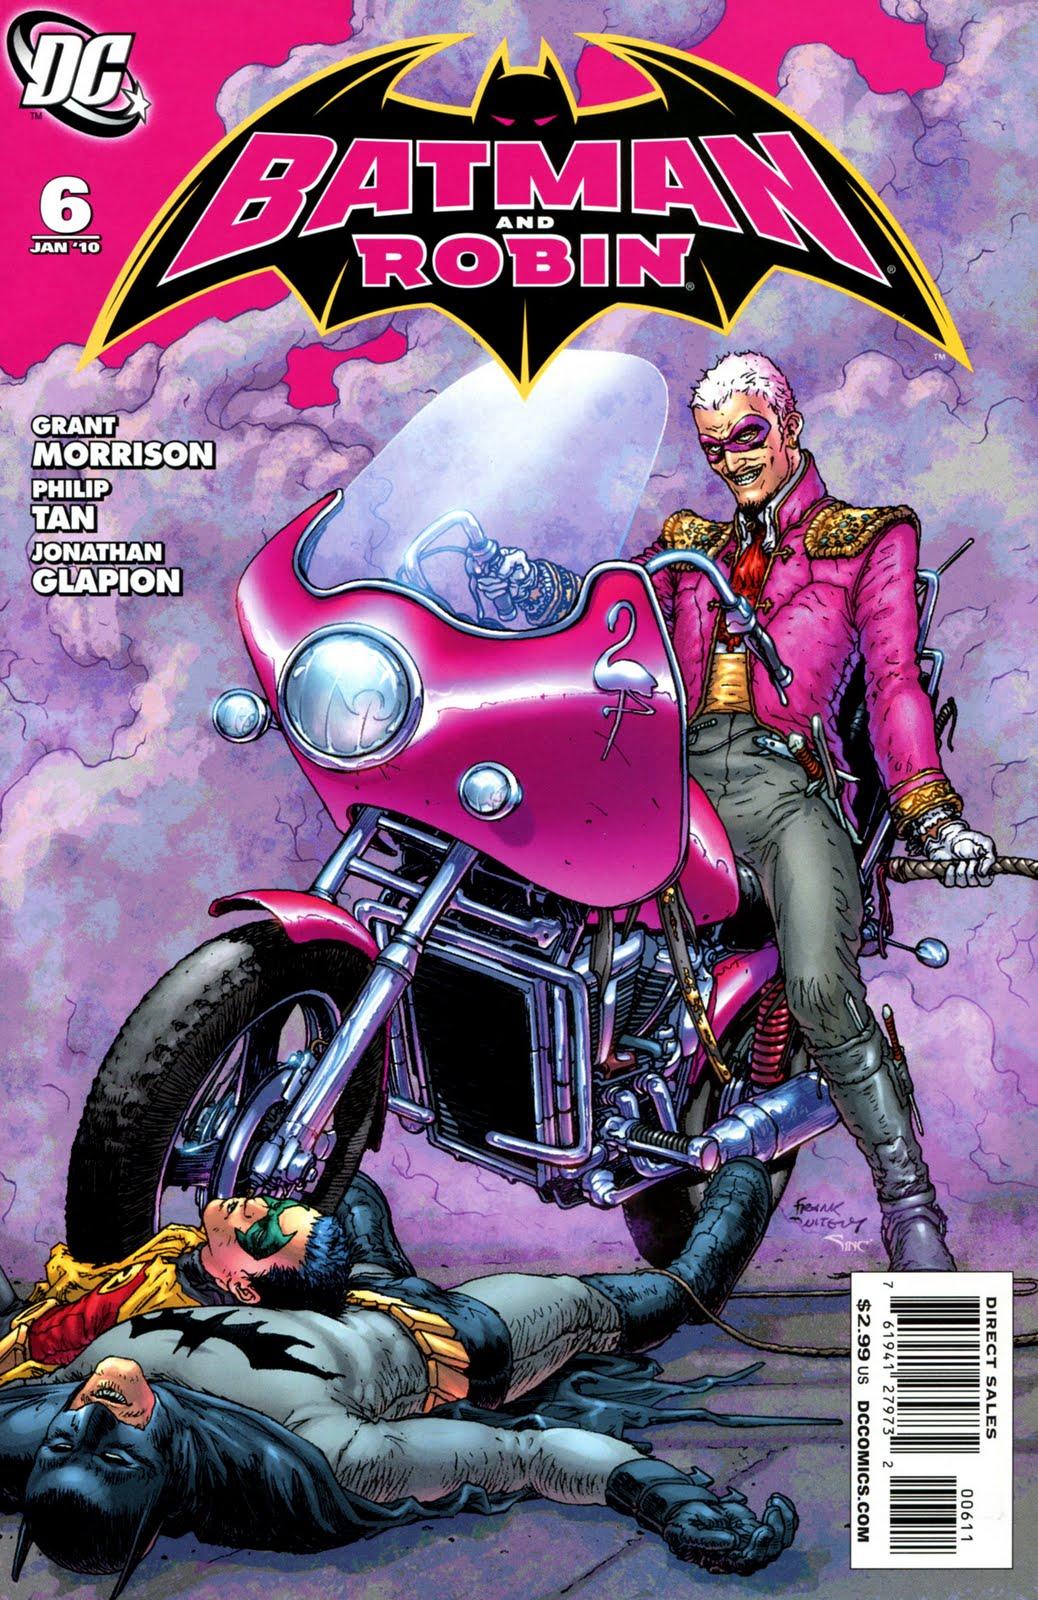 Batman and Robin Vol 1 6 | DC Database | FANDOM powered by Wikia